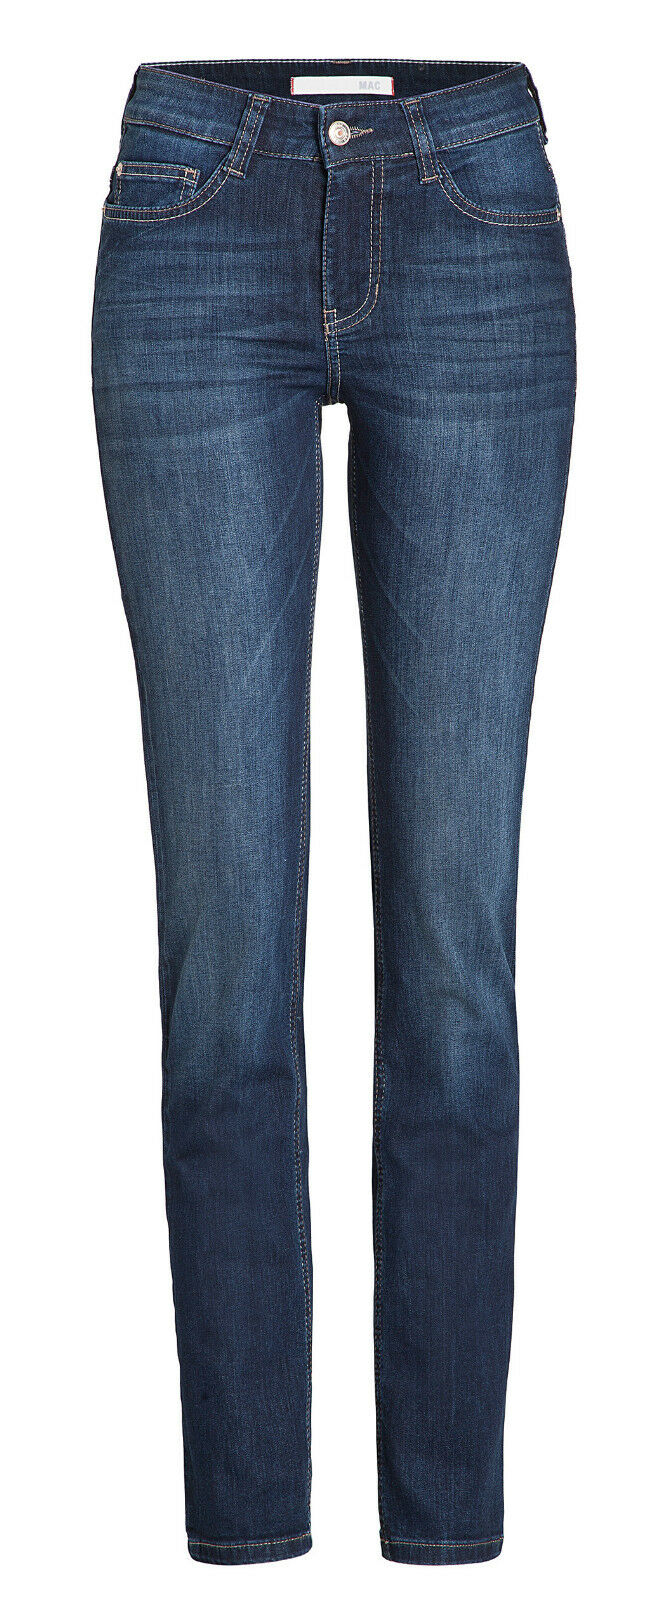 MAC Damen Jeans Angela 5240 NEU new basic wash D845 Alle Größen Längen